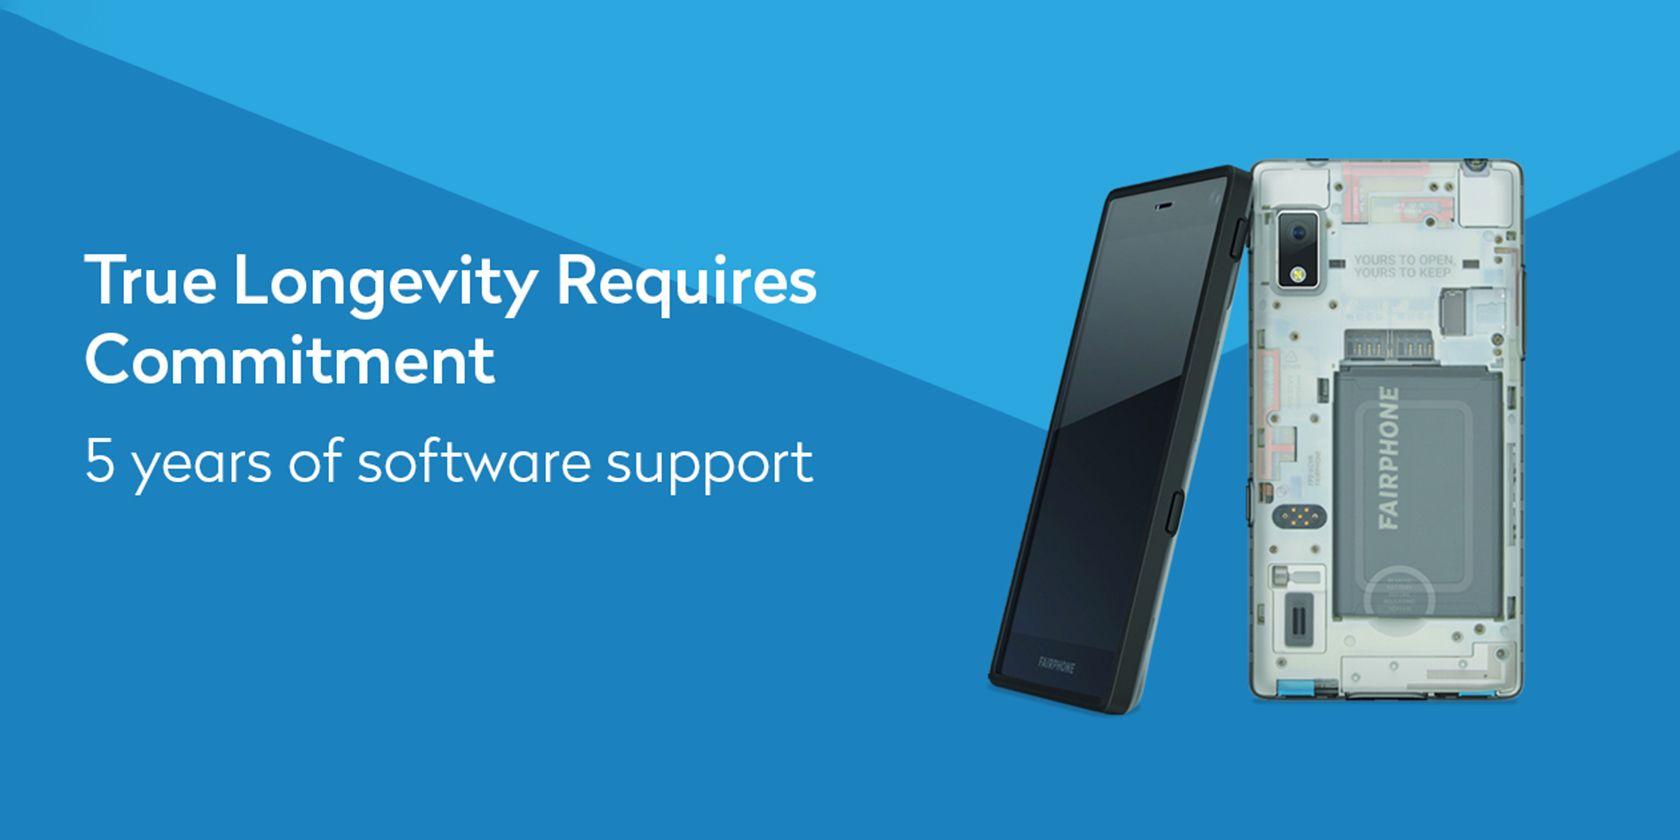 Fairphone 2 5 ساله به اندروید 9 بروزرسانی می شود